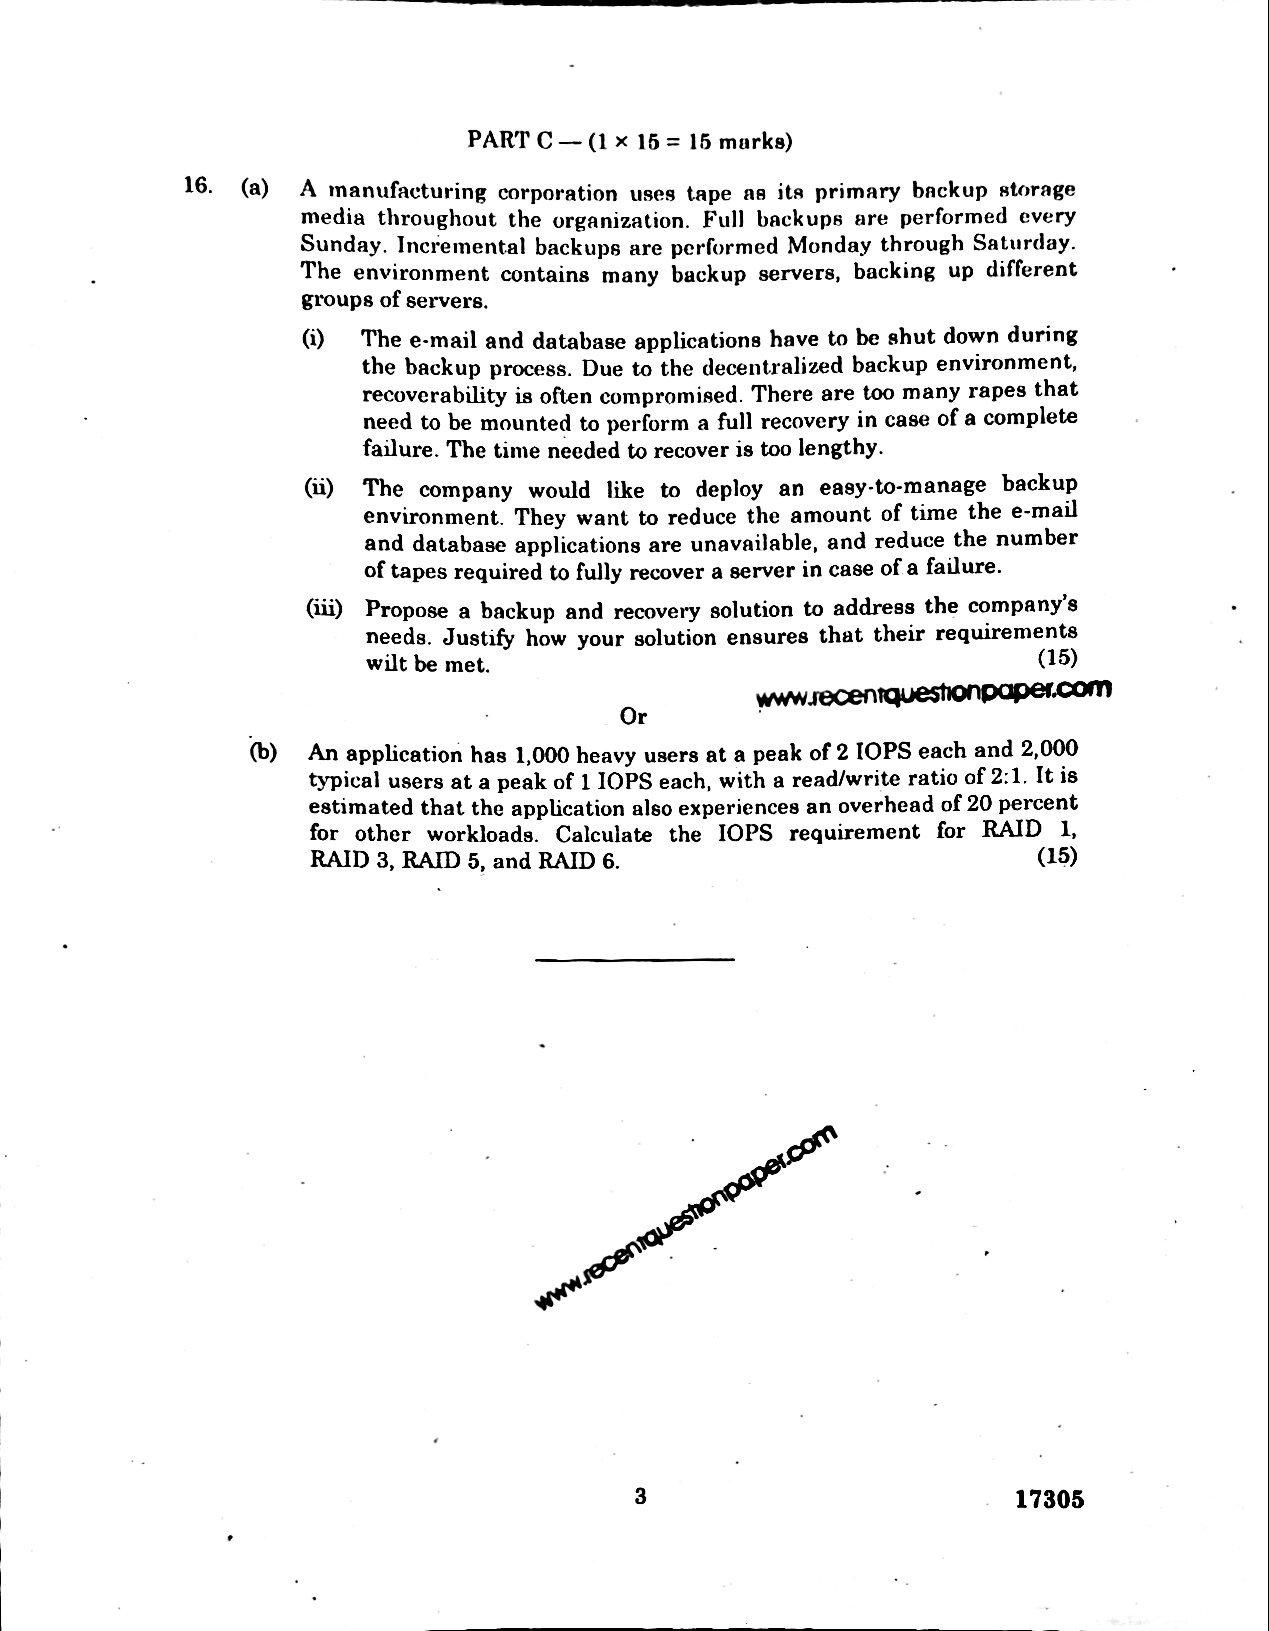 CP7029 INFORMATION STORAGE MANAGEMENT 3 - Recent Question Paper